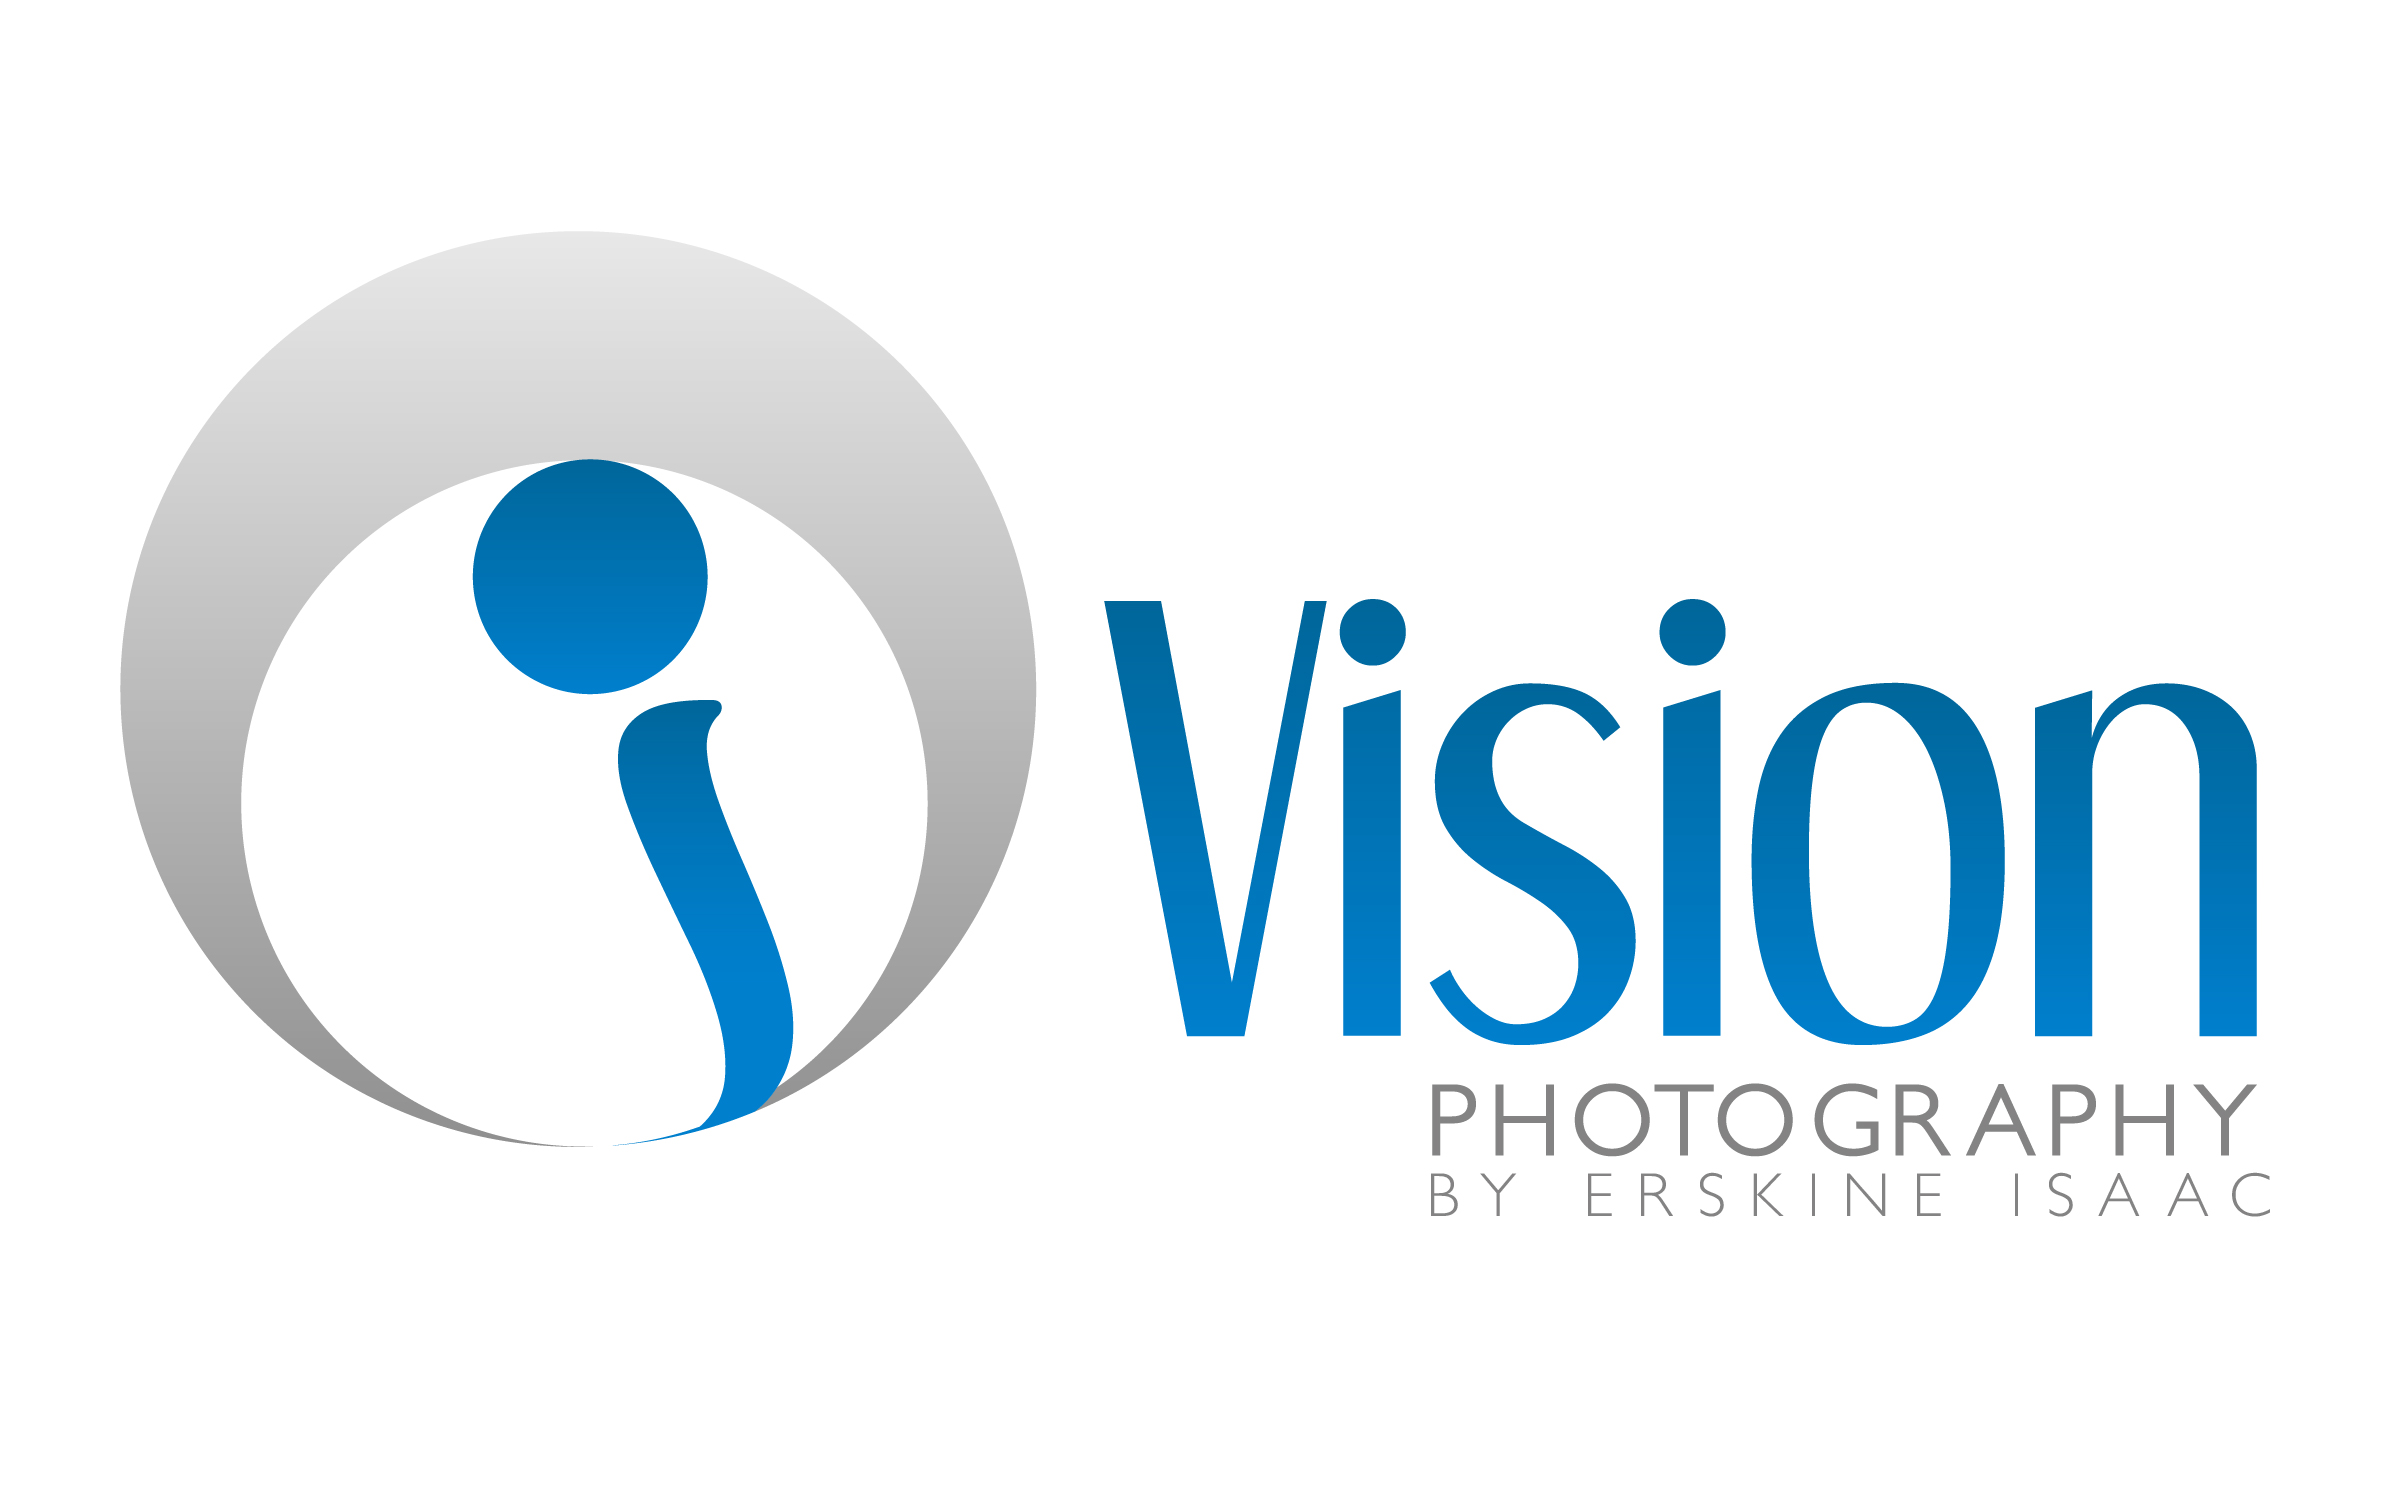 iVision Photo